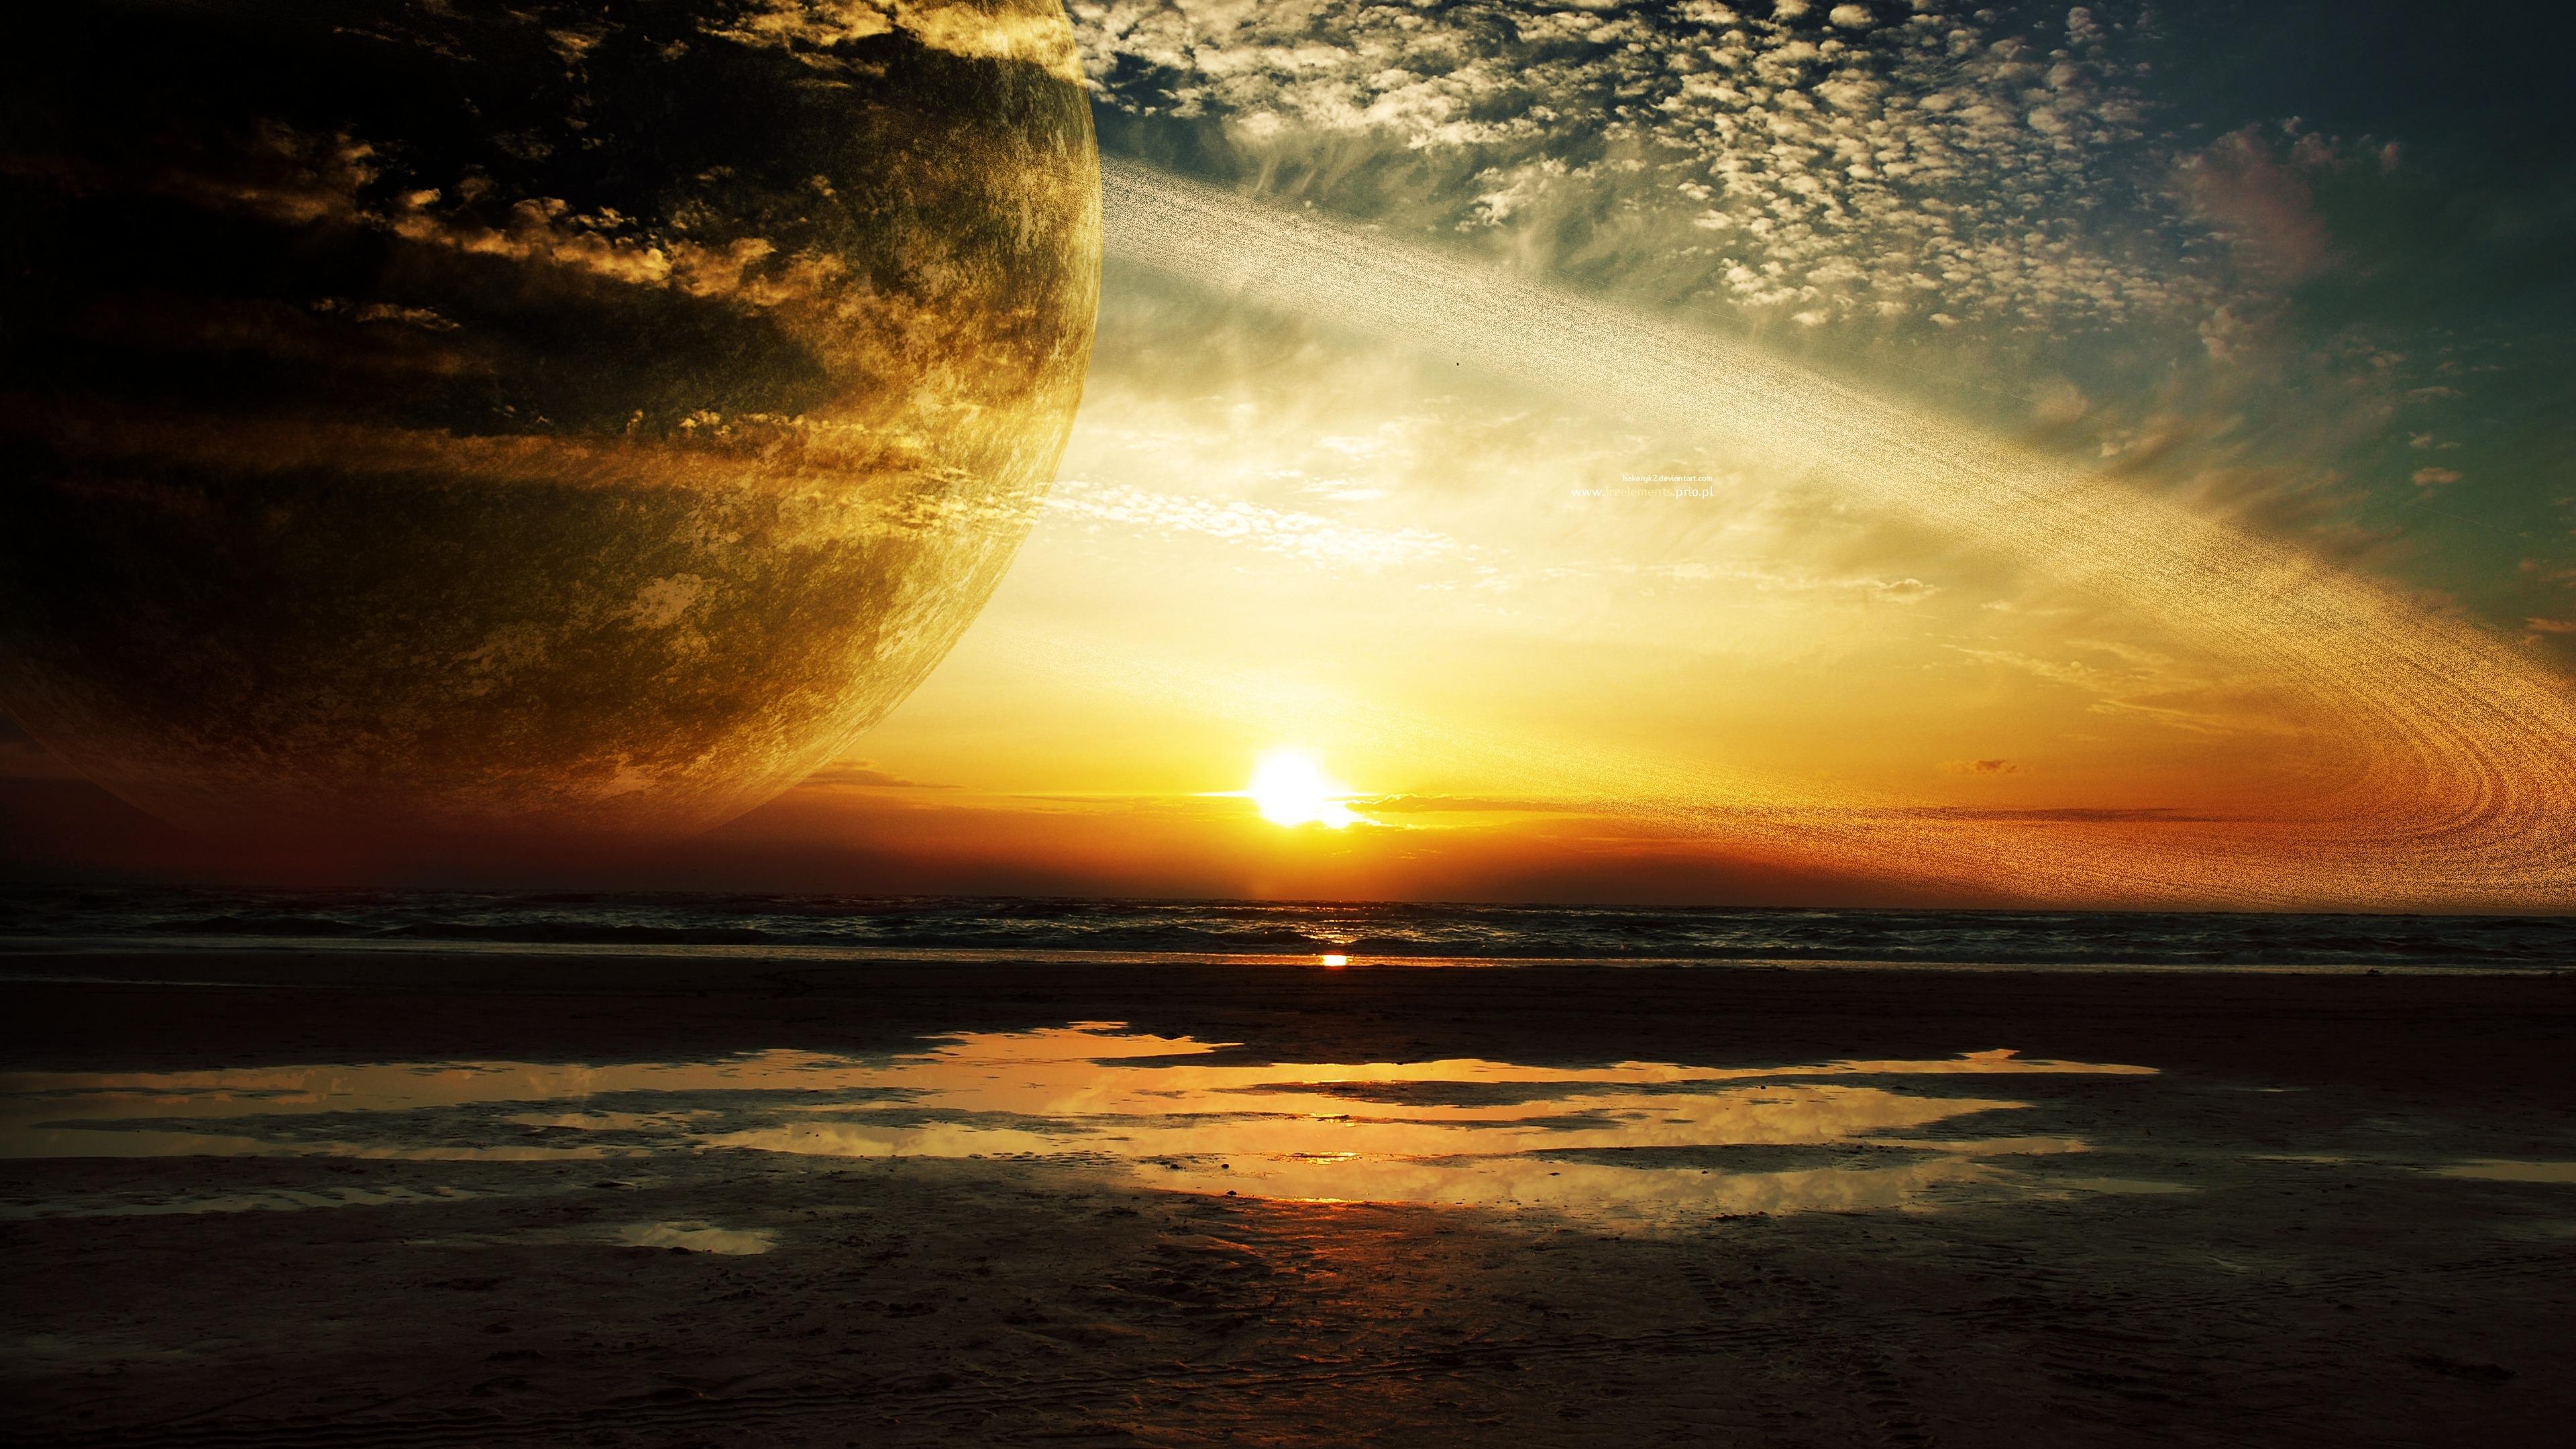 Wallpaper sunlight sunset sea planet reflection sky beach sunlight sunset sea planet reflection sky beach rings sunrise evening morning coast sun horizon atmosphere dusk altavistaventures Images